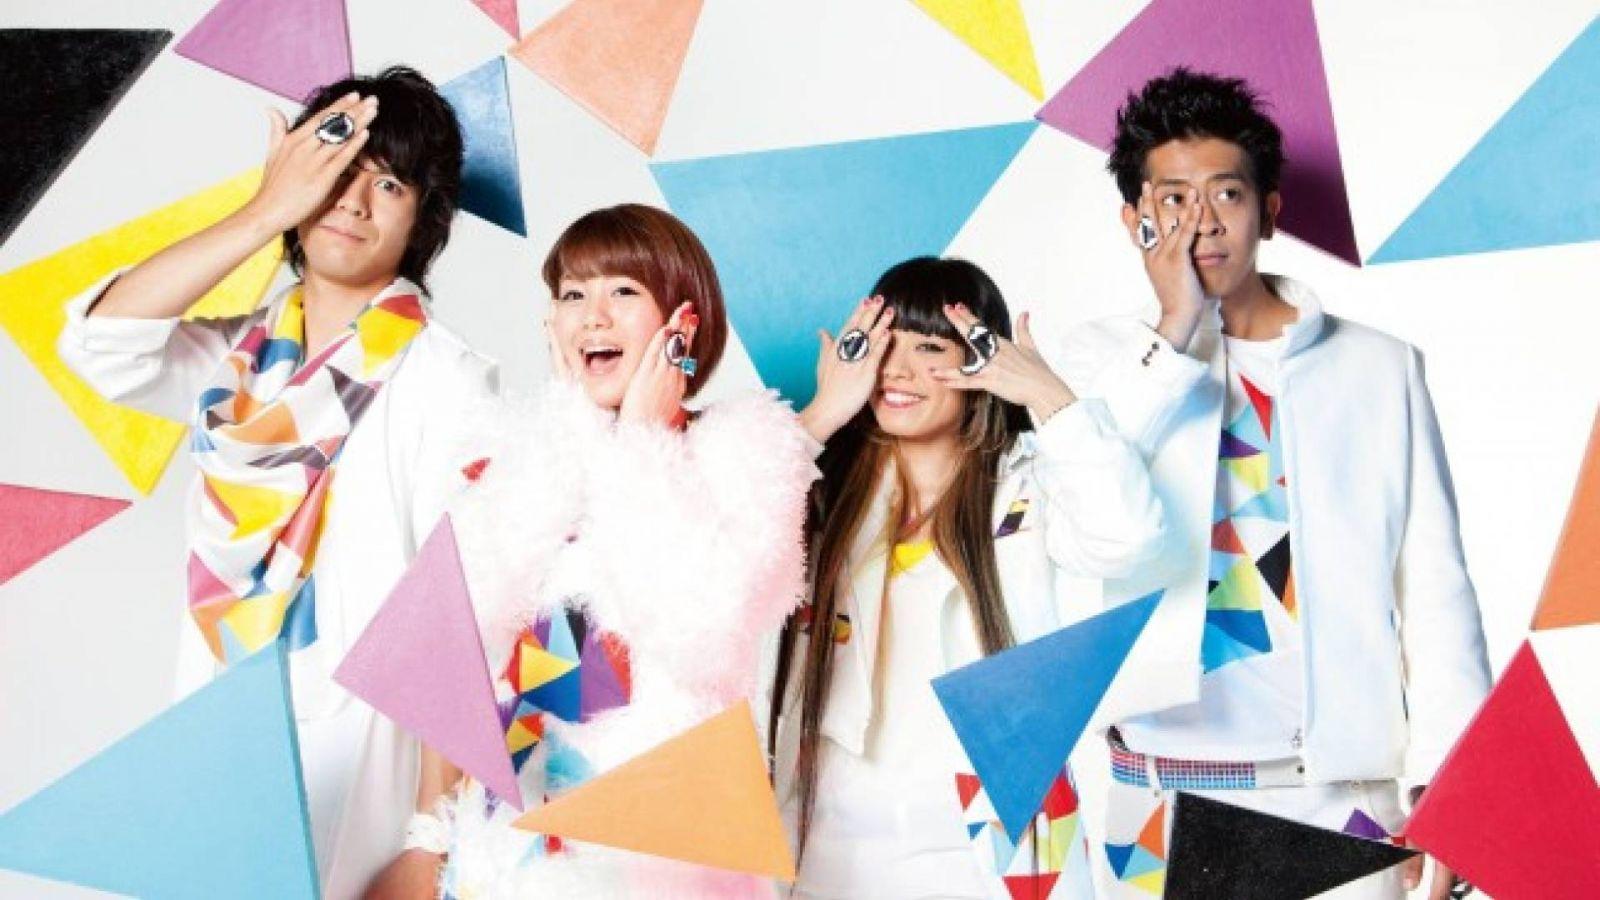 7!! © Sony Music Entertainment (Japan) Inc.